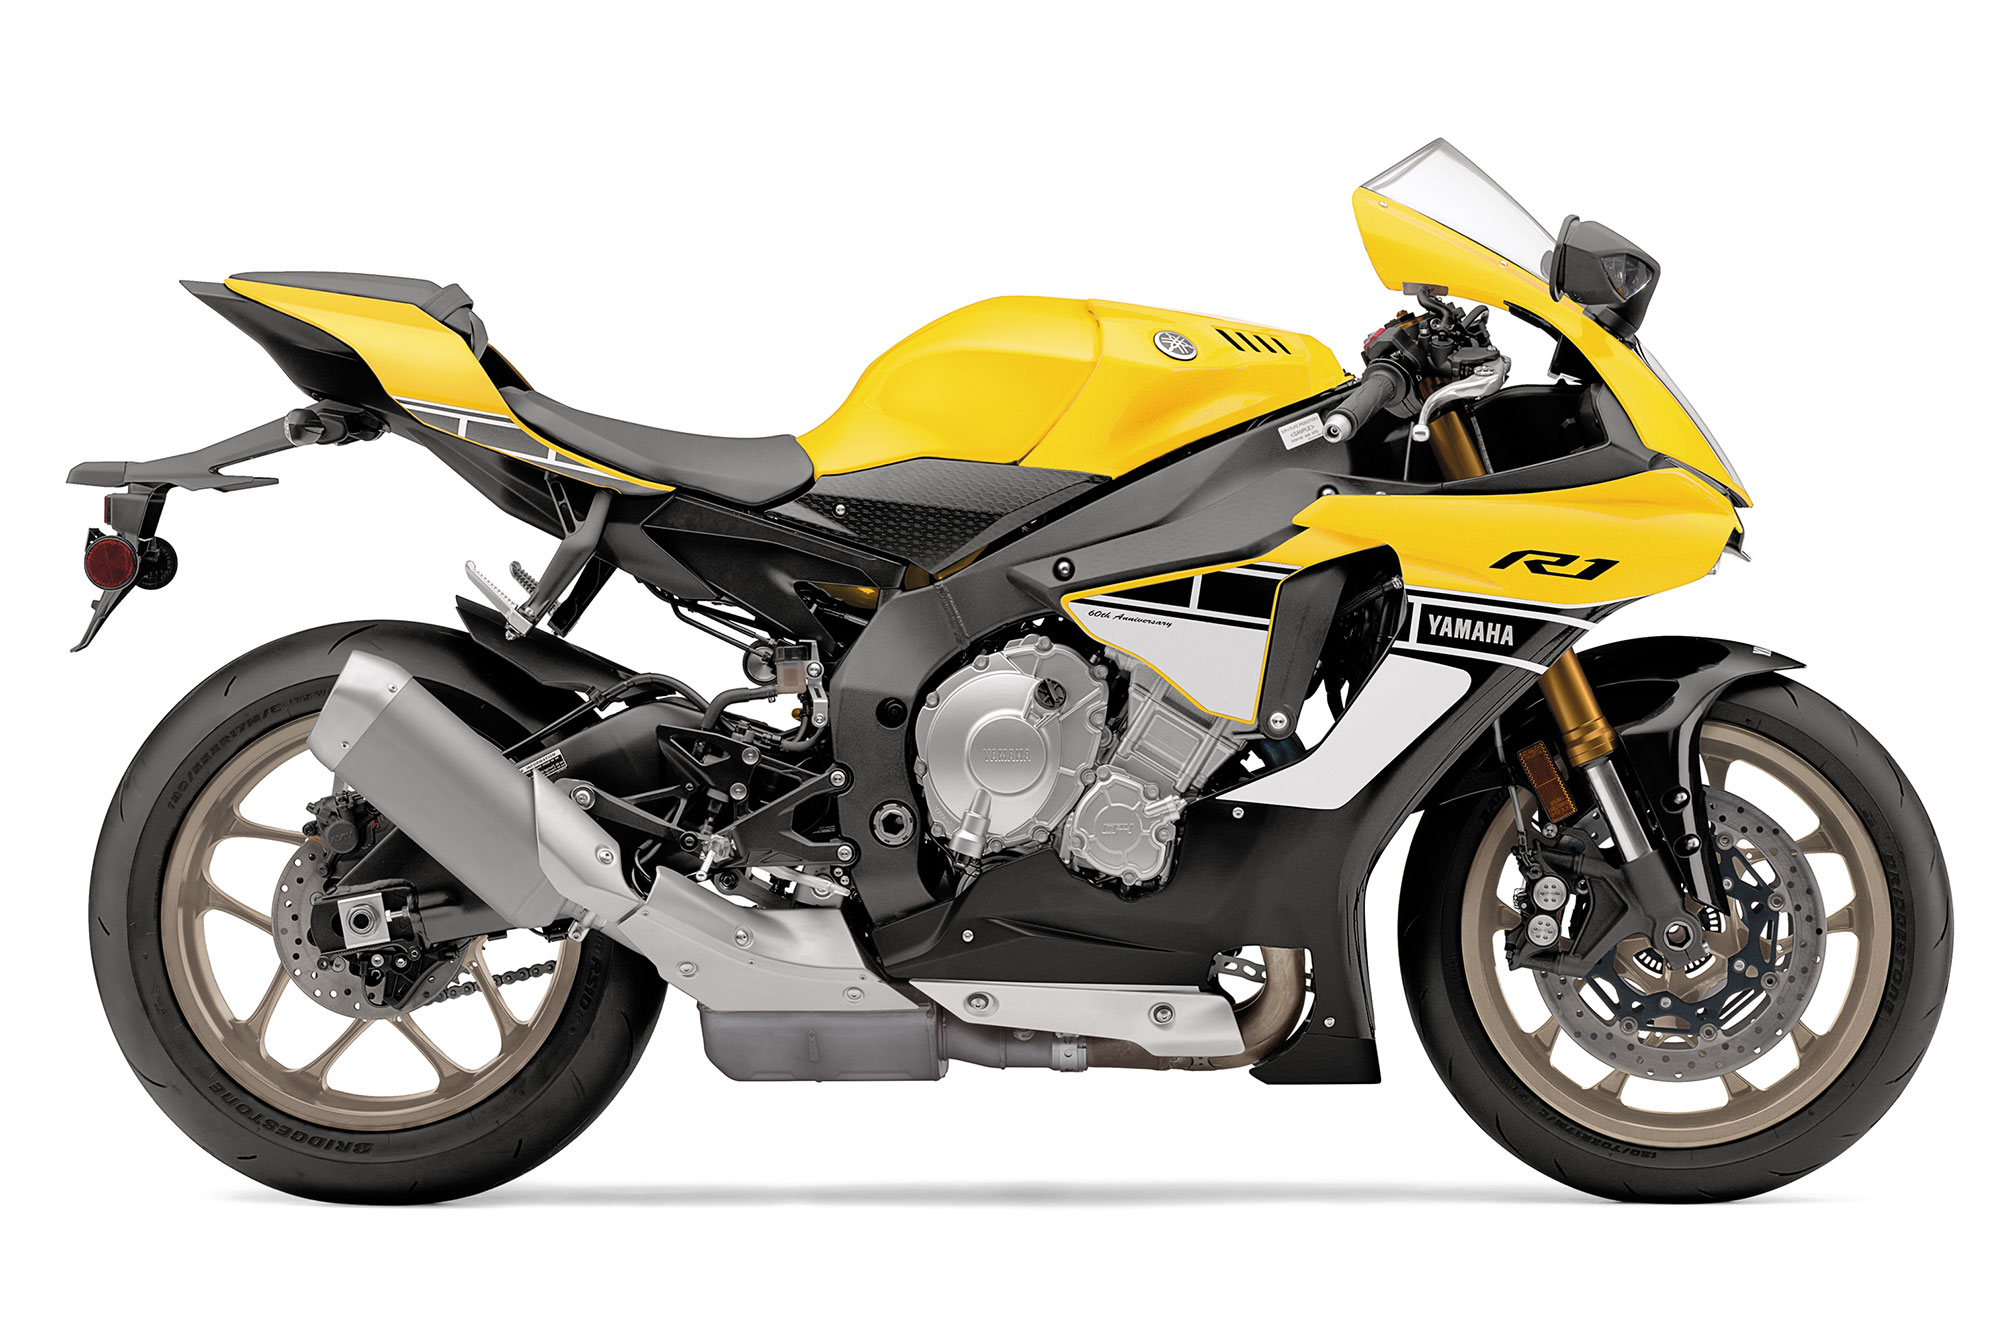 2016 Yamaha YZF R1 Review 2016x1344